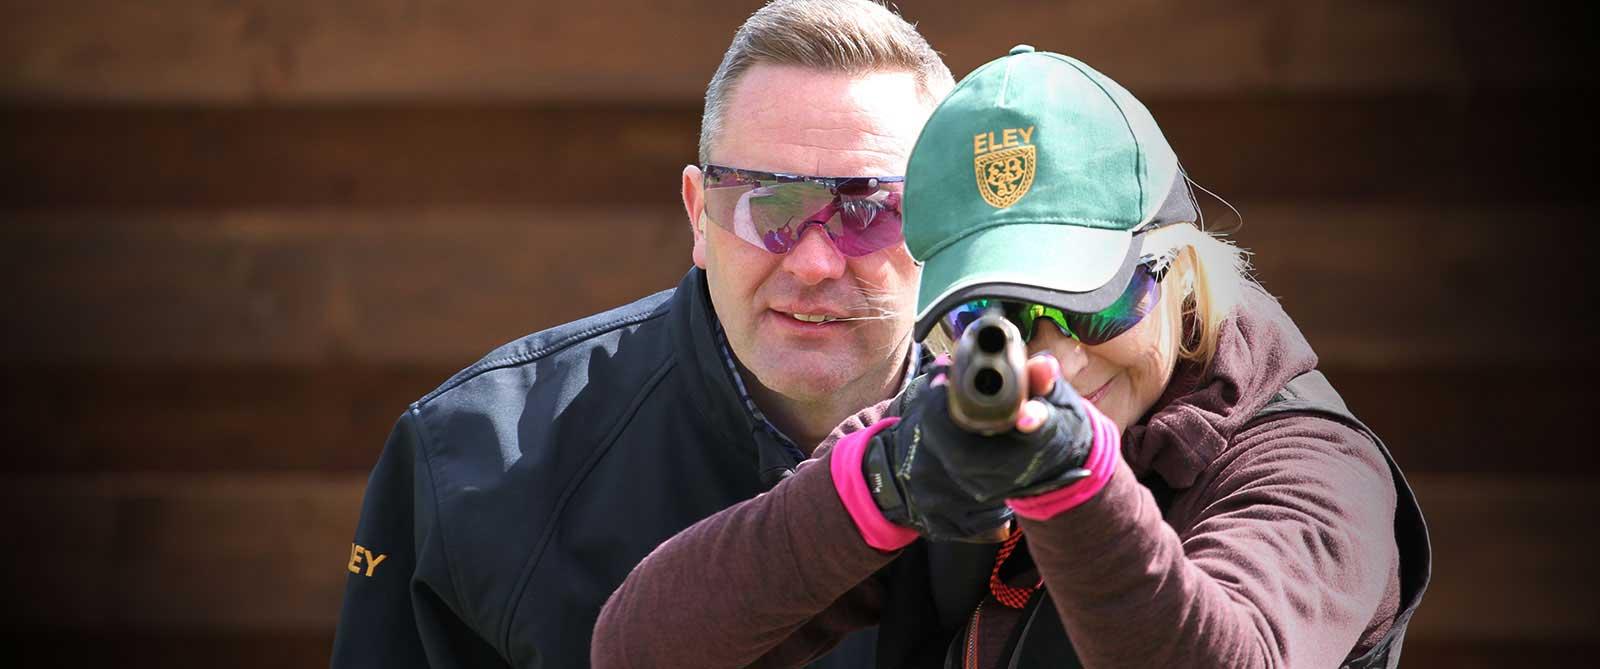 david beardsmore shotgun lesson